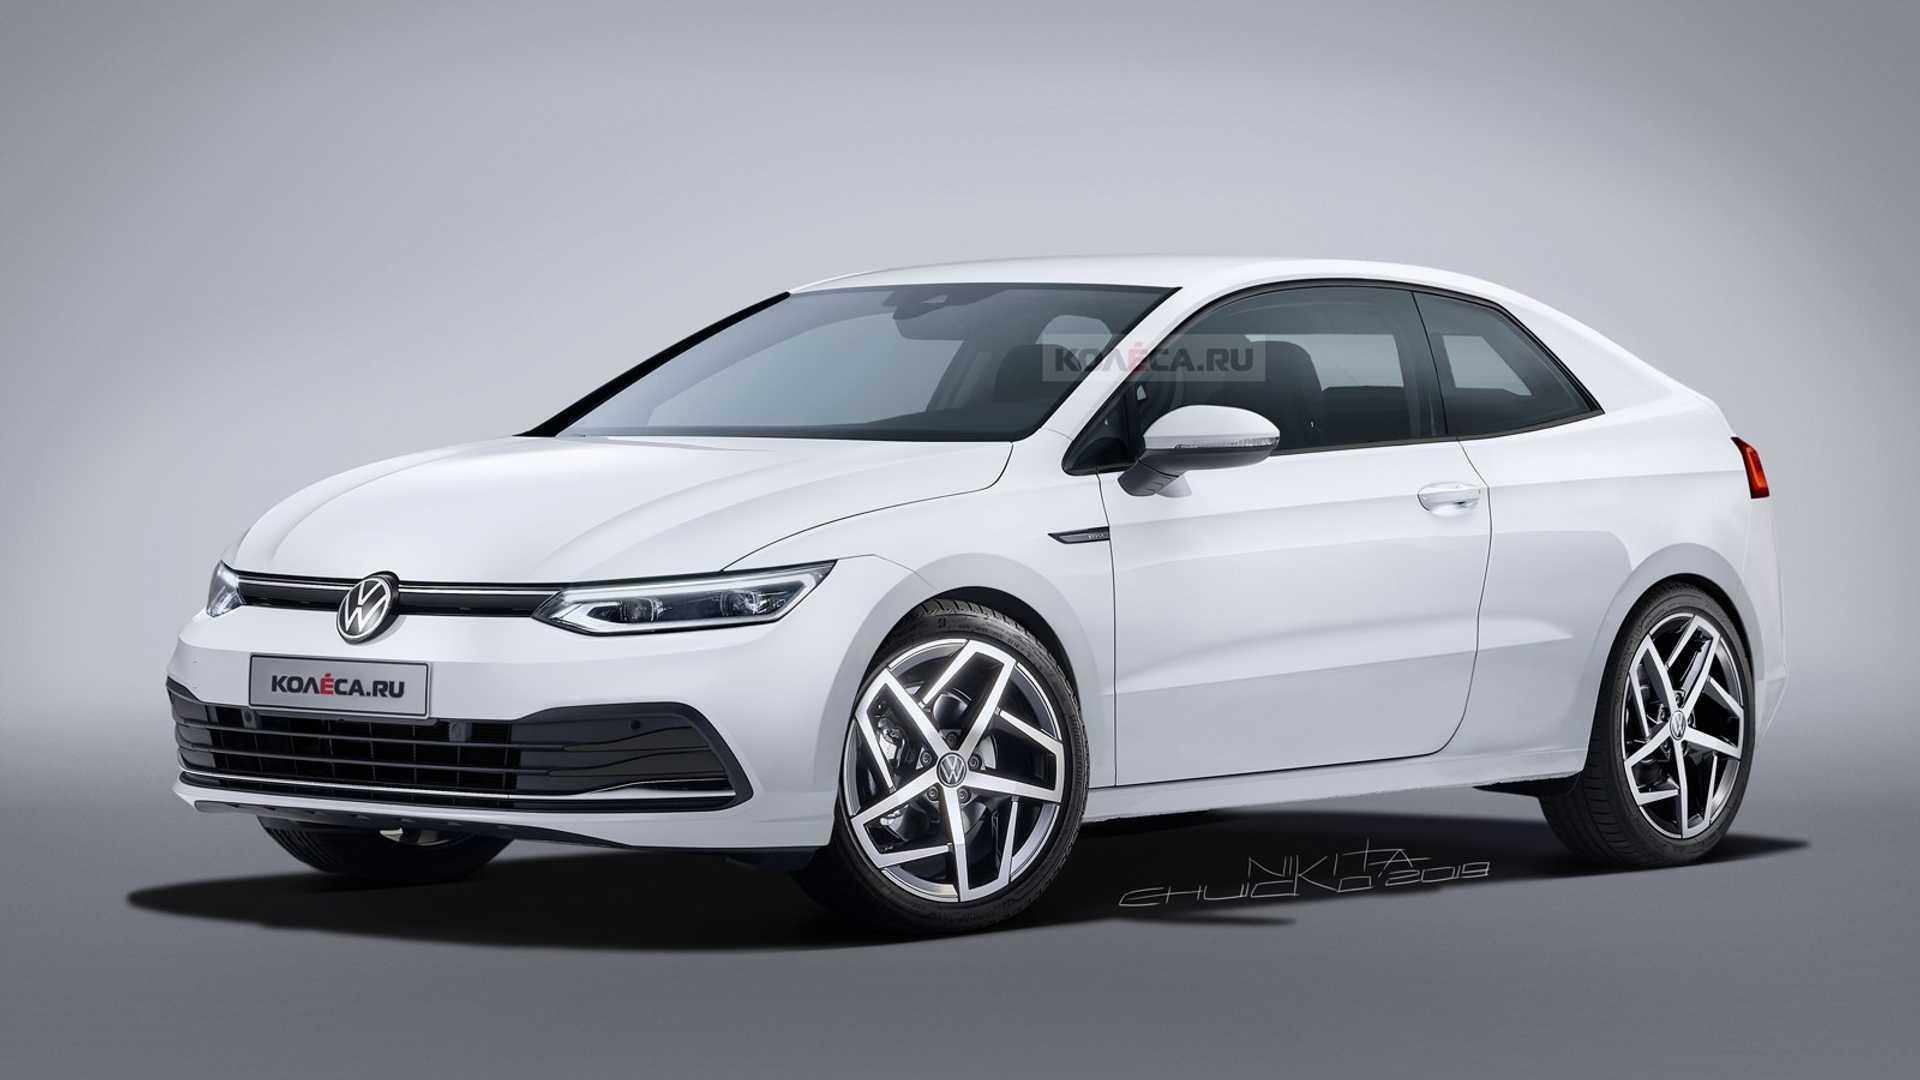 New VW Corrado based on Golf 8 is a pipe dream